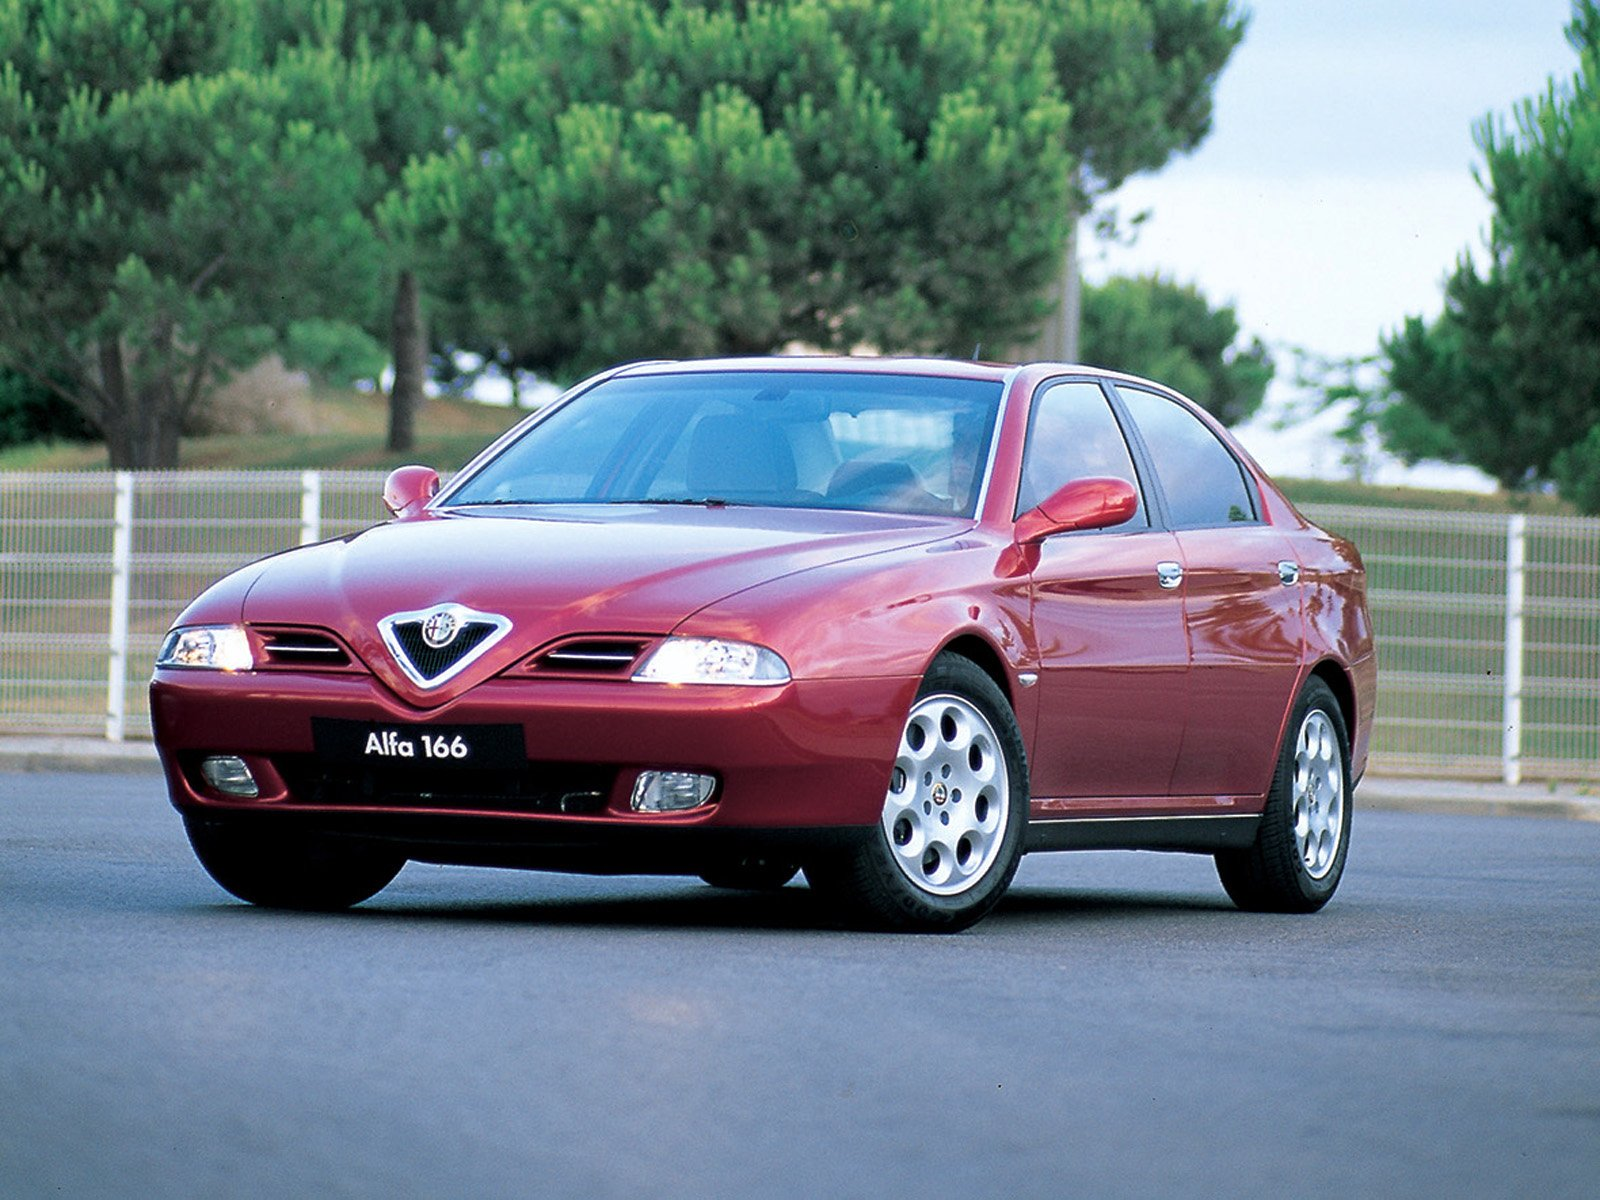 Alfa Romeo 4C >> Alfa Romeo 166 picture # 9214 | Alfa Romeo photo gallery ...